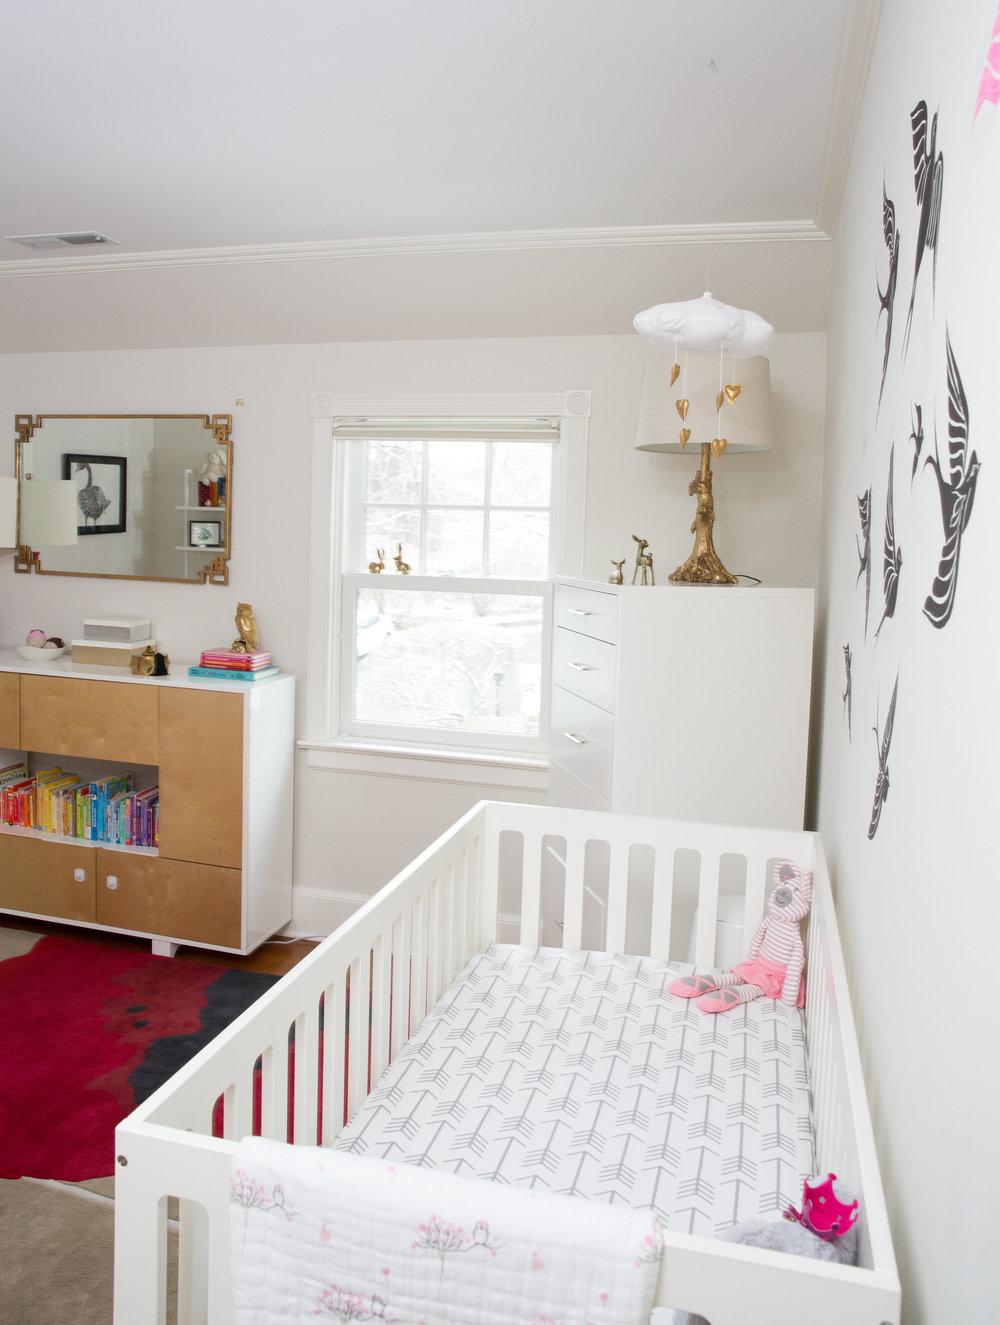 Ceci_Johnson_Welcome_Baby_Elle_Hazel_Johnson_Nursery_Tour_Design_Baby_Product_Pick_kid_Ana_Schechter_newborn_photography_24.jpg